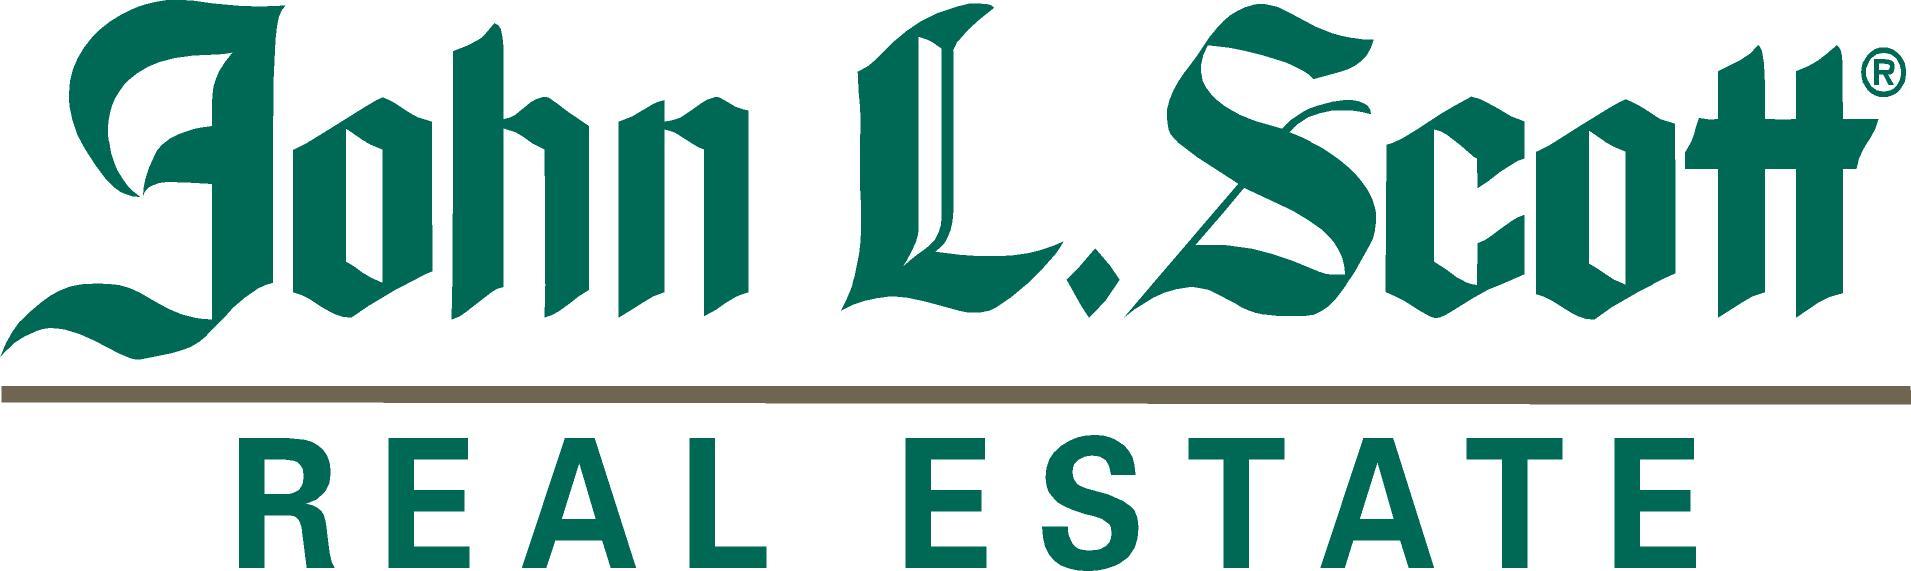 JLS-logo